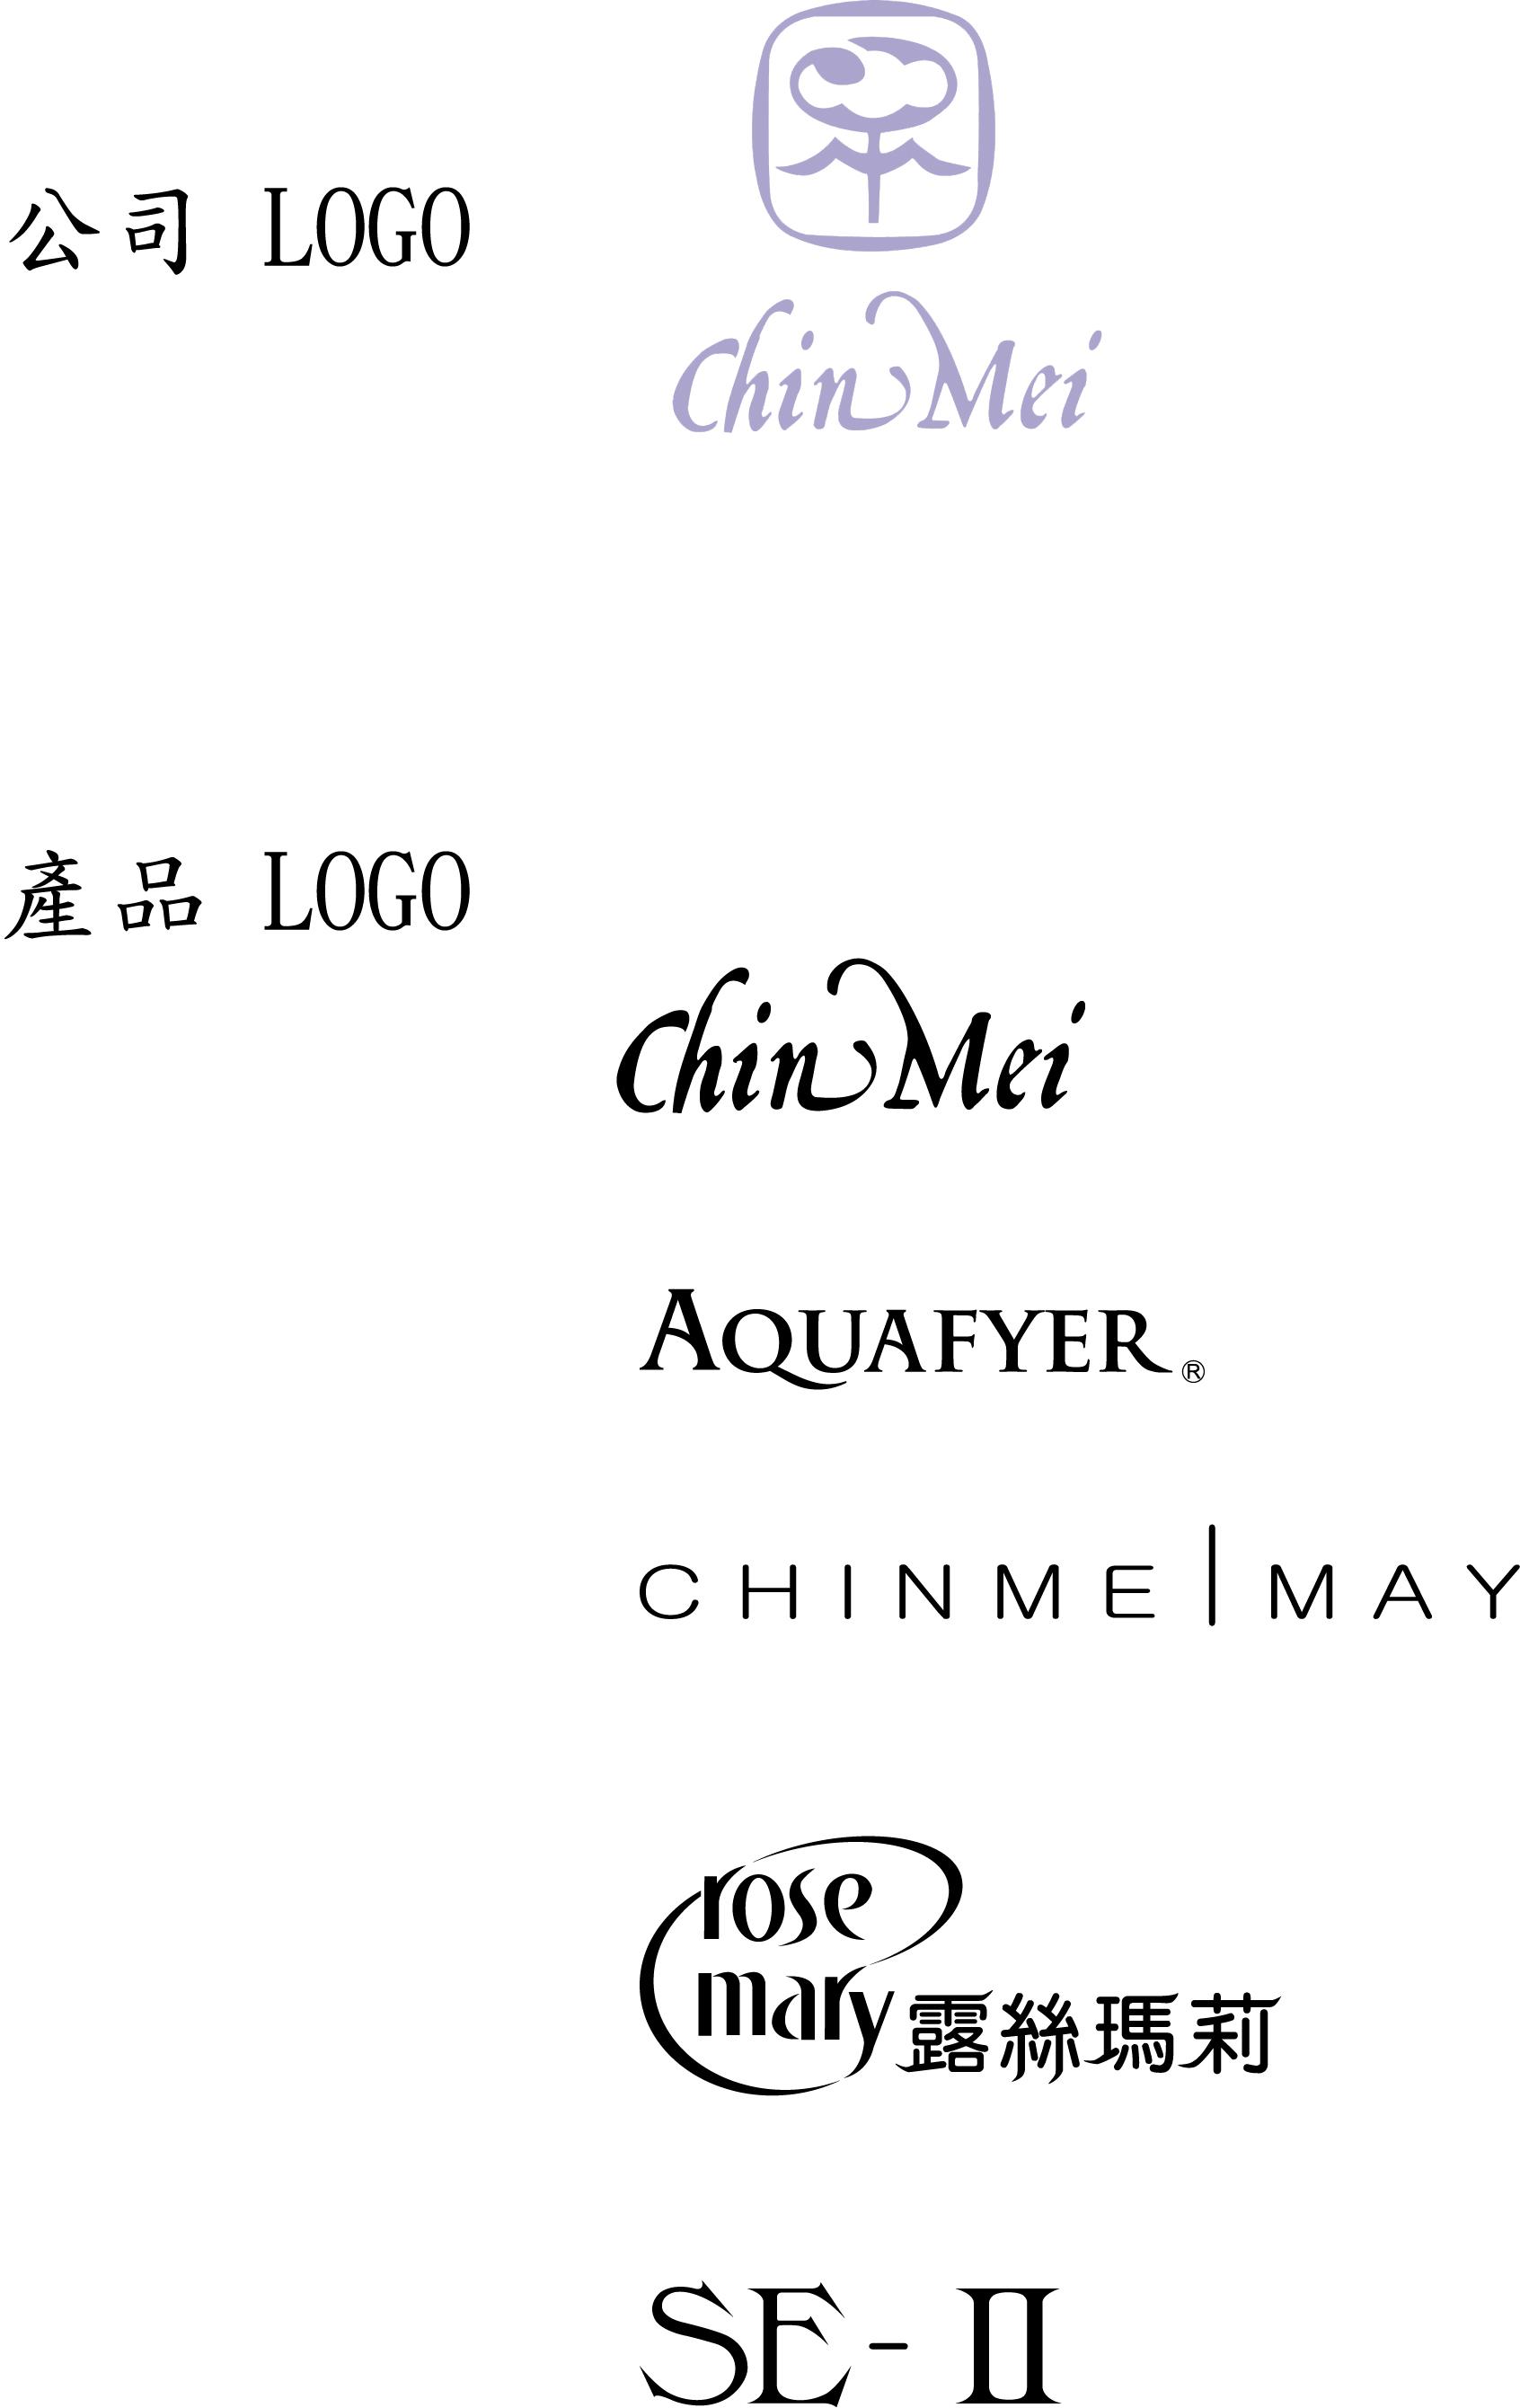 今美(Chin Mei)